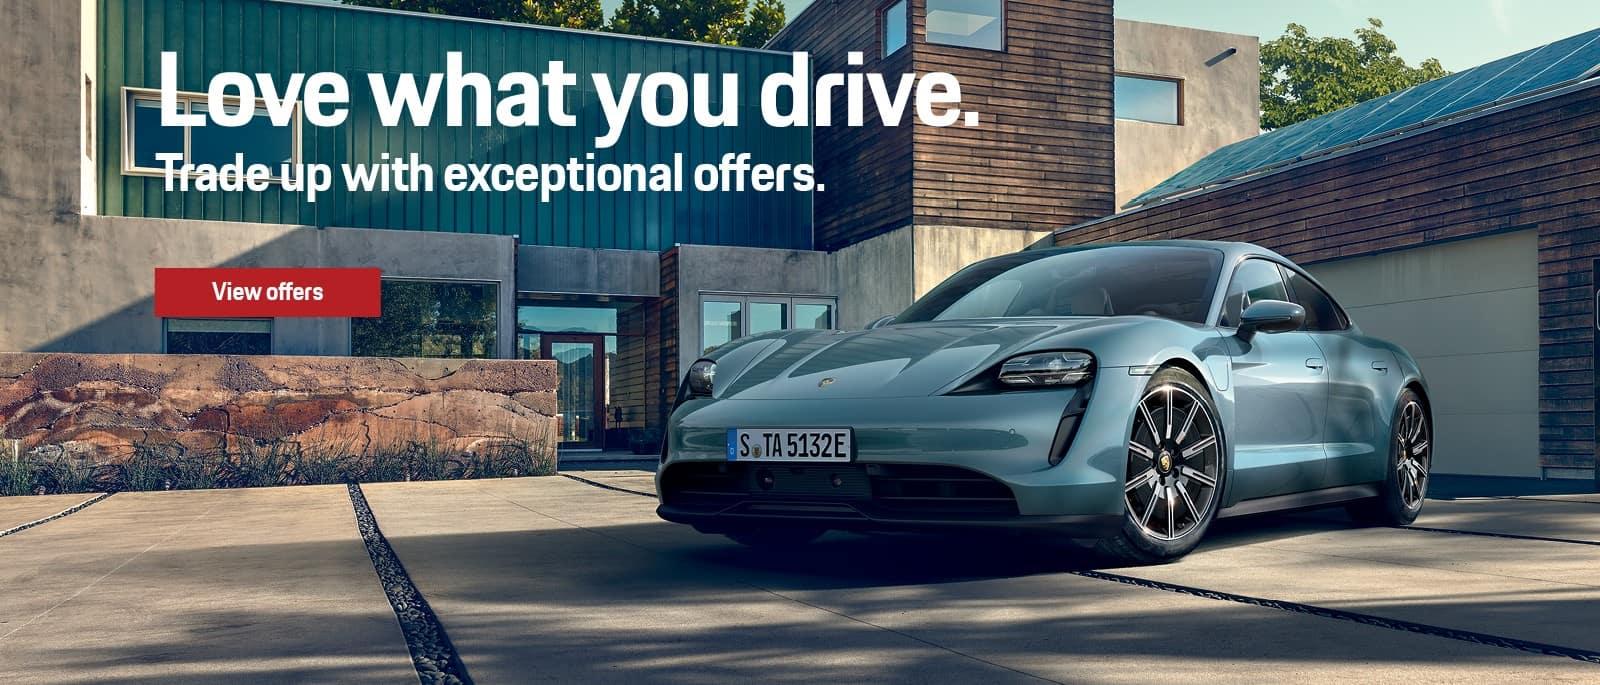 Porsche Love What You Drive Event_2.21